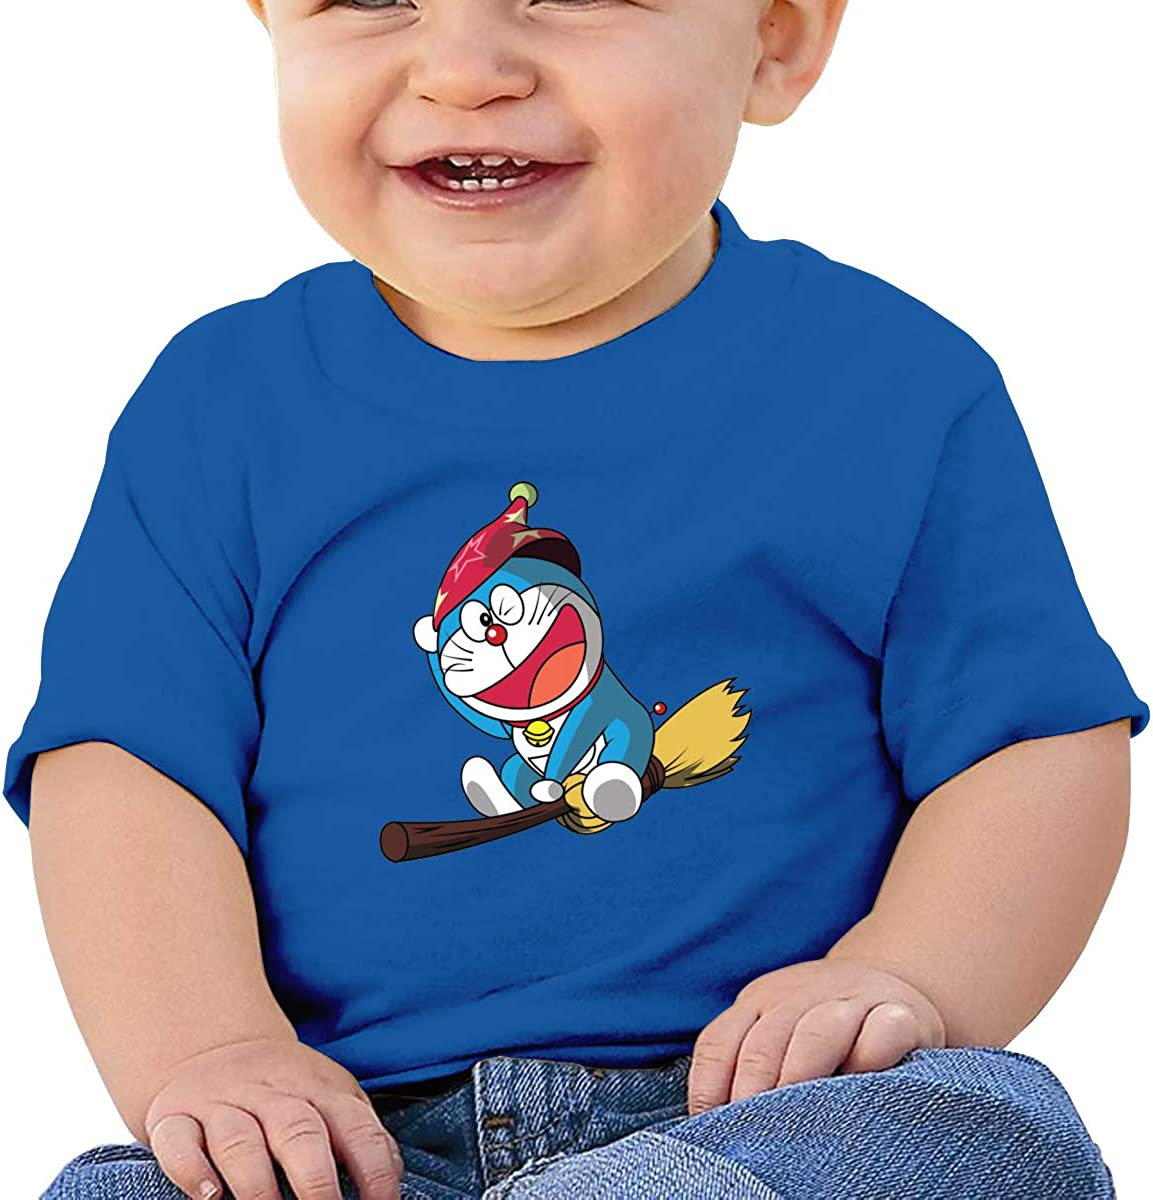 EVE JOHN Doraemon Riding A Magic Broom Tee Comfortable T Shirt for Toddler Black